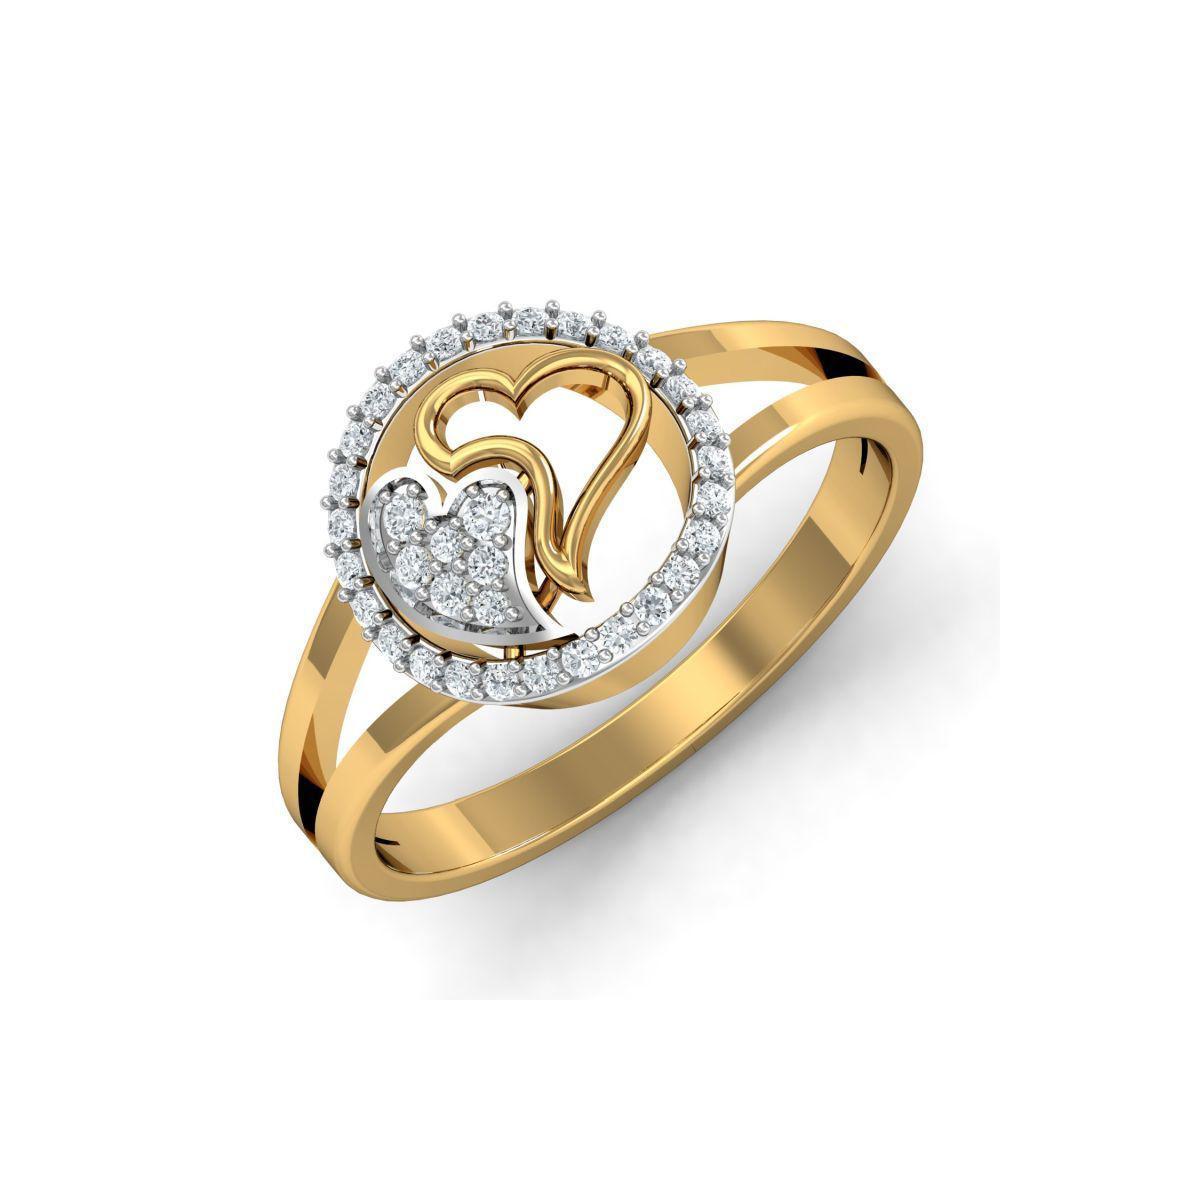 Diamoire Jewels 18kt Yellow Gold Pave 0.18ct Diamond Infinity Ring II - UK G 1/4 - US 3 1/2 - EU 45 3/4 x5oqmHJ